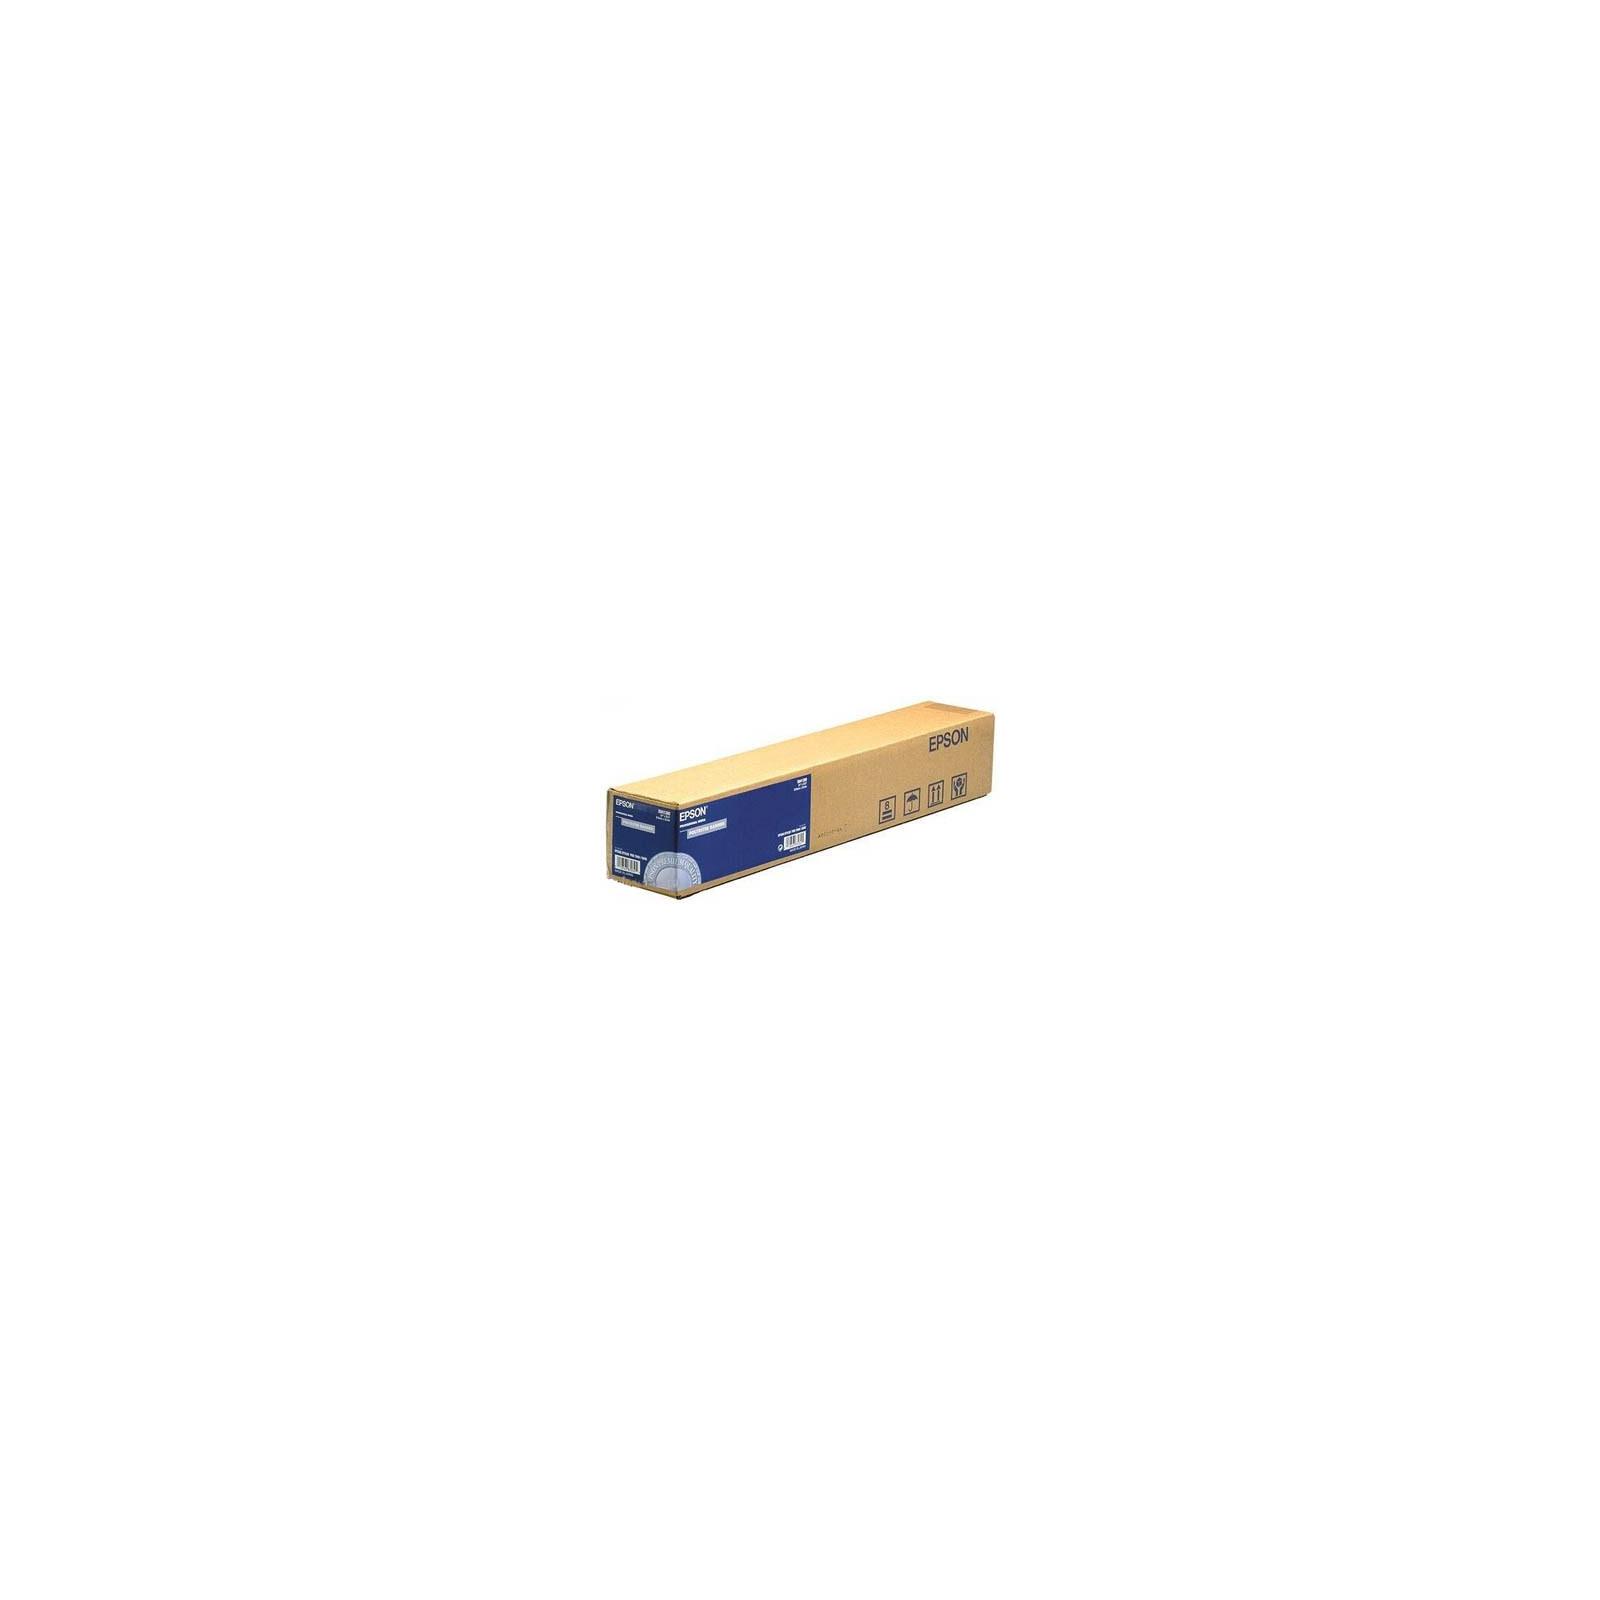 "Бумага EPSON 64"" Doubleweight Matte Paper (C13S042138)"